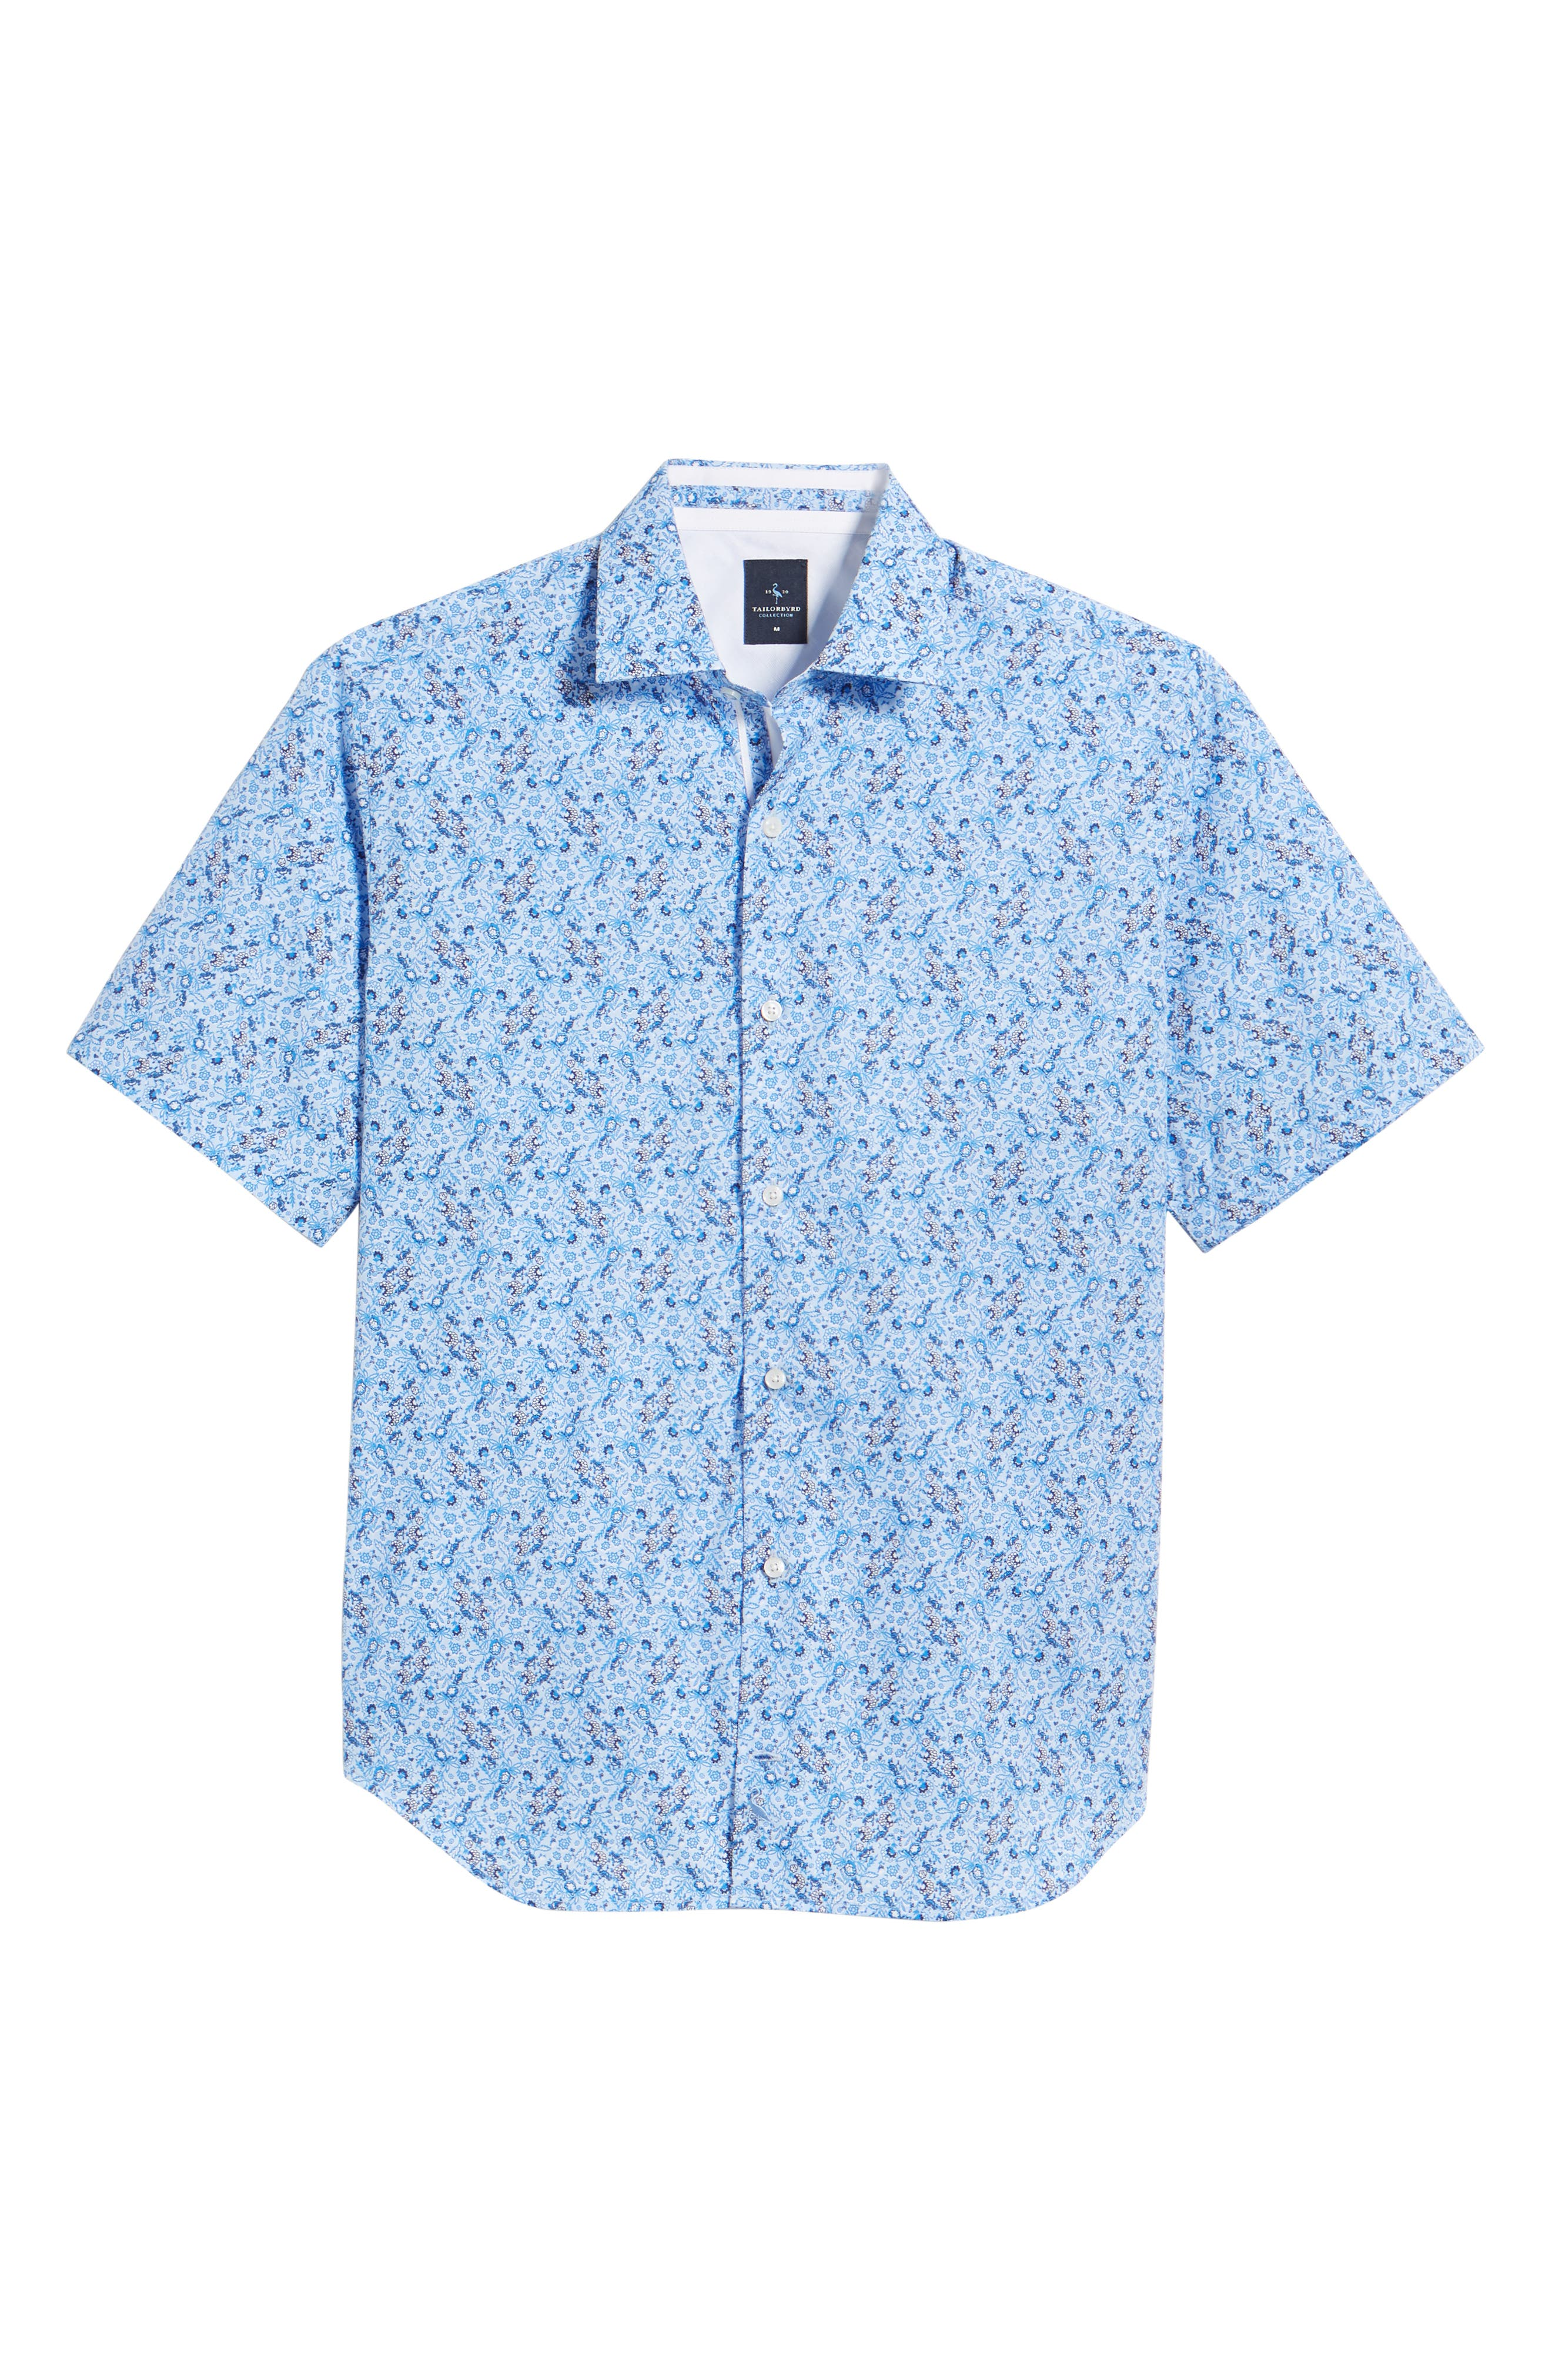 Baer Regular Fit Print Sport Shirt,                             Alternate thumbnail 6, color,                             Blue